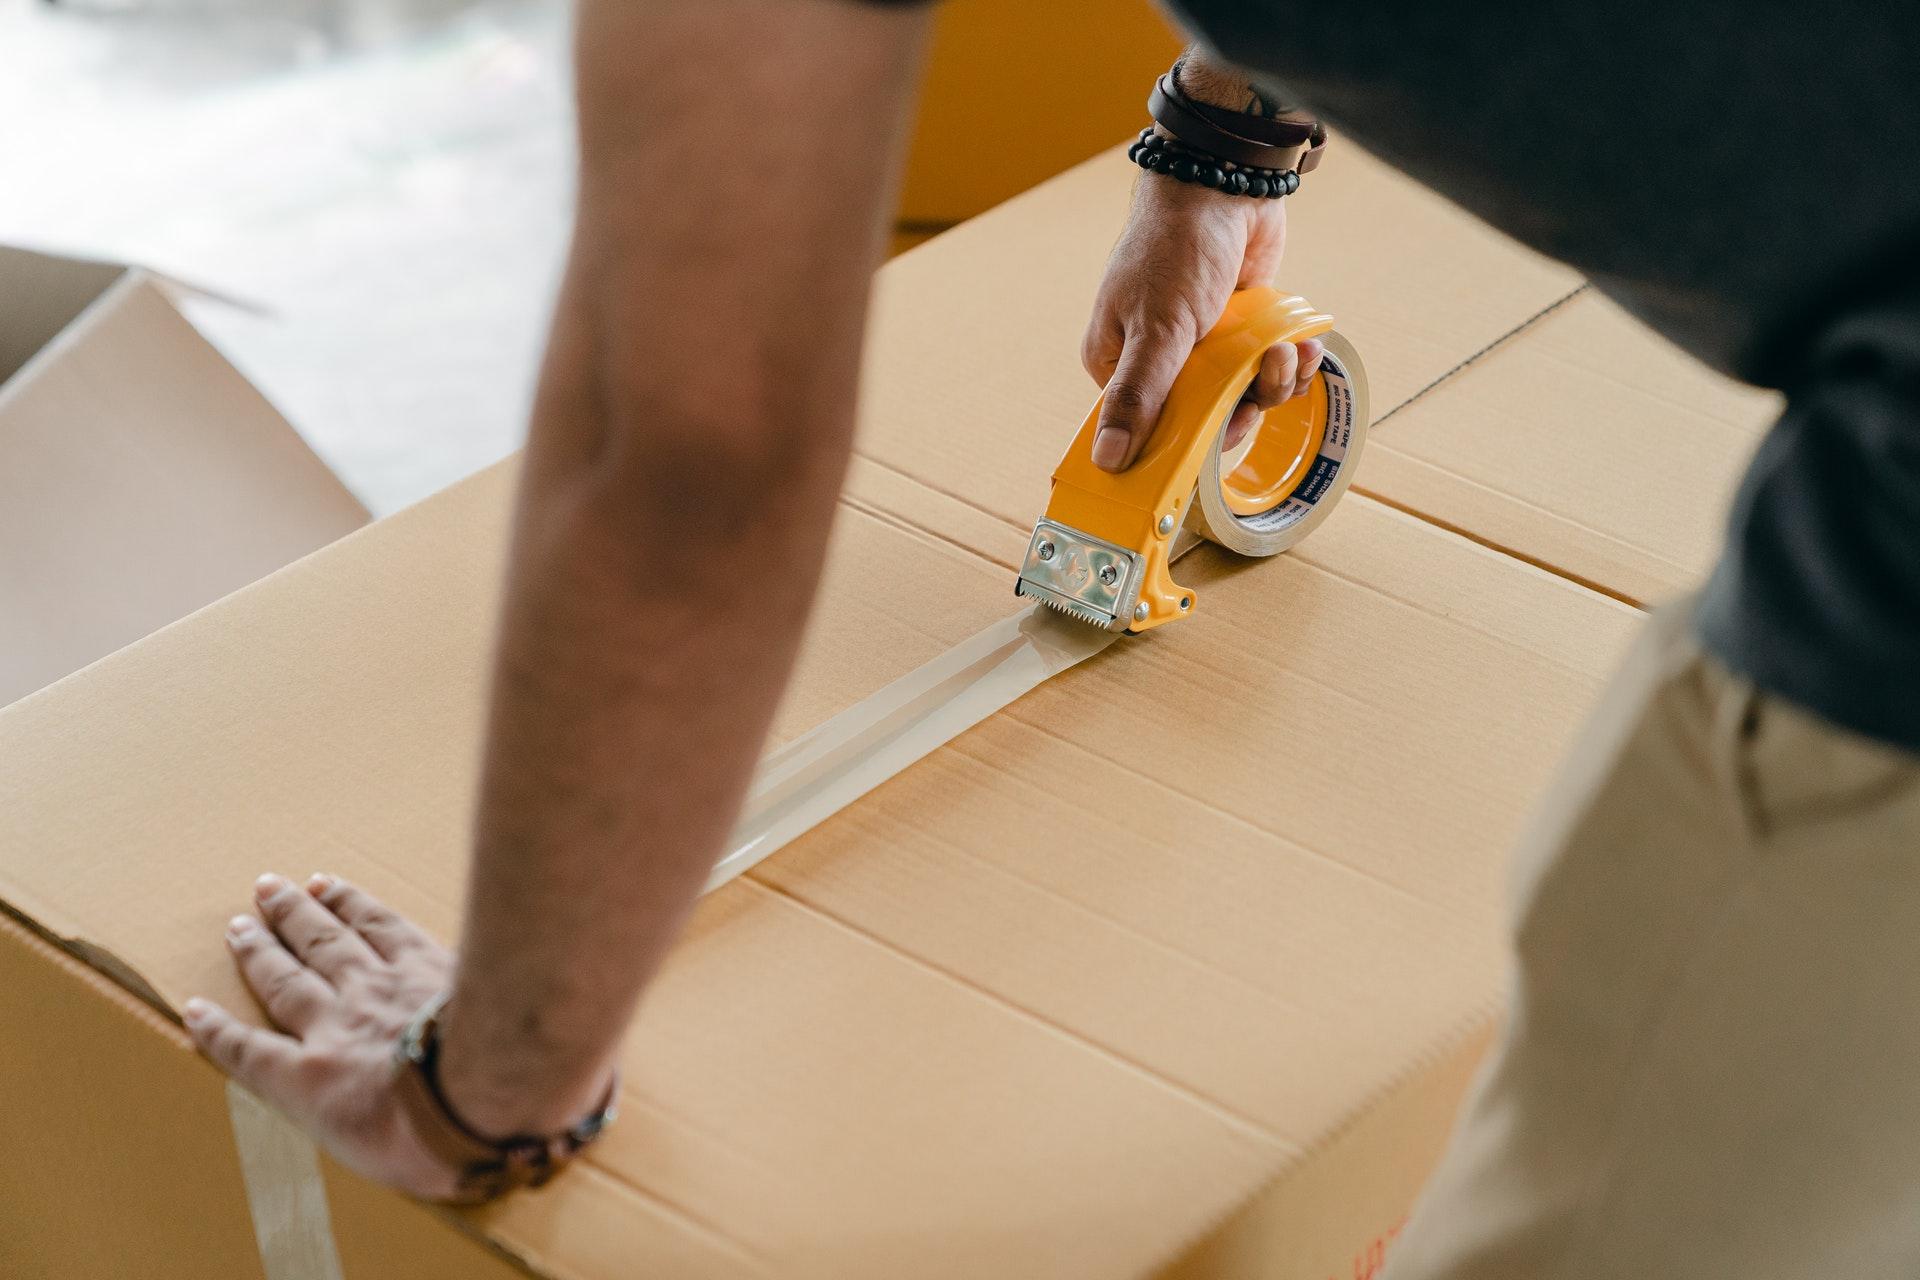 Amazon Produkt IDs